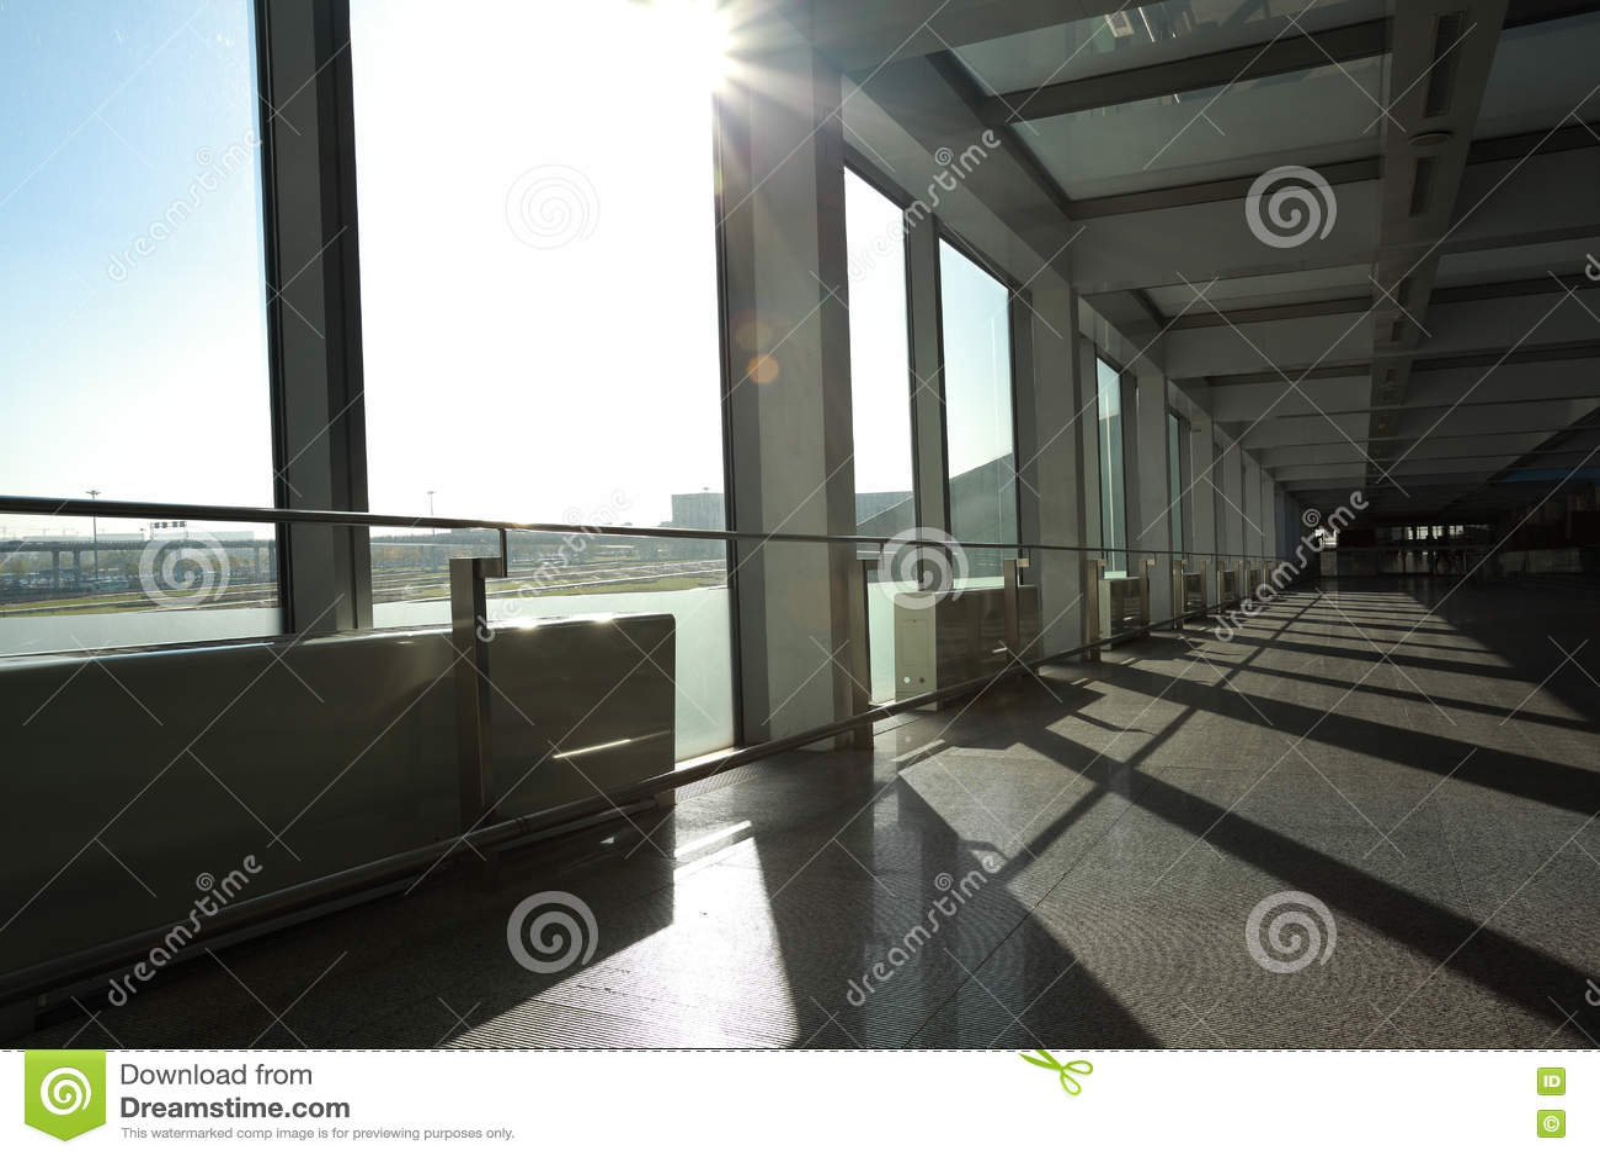 Sunny on modern glass office windows building interior corridor